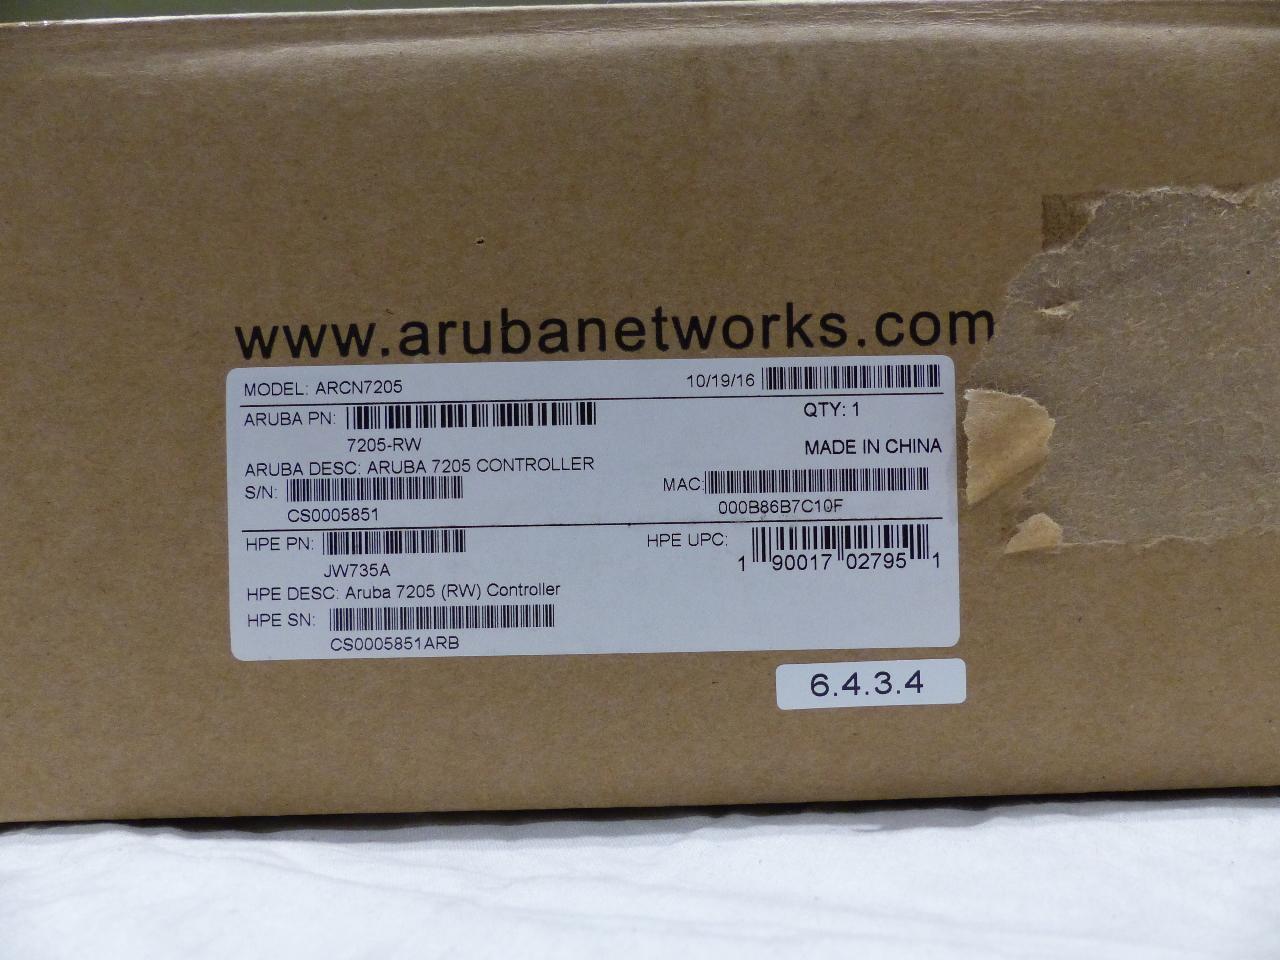 ARUBA HPE NETWORK SYSTEMS 7205 ARCN7205 MOBILITY CONTROLLER JW735A 7205-RW